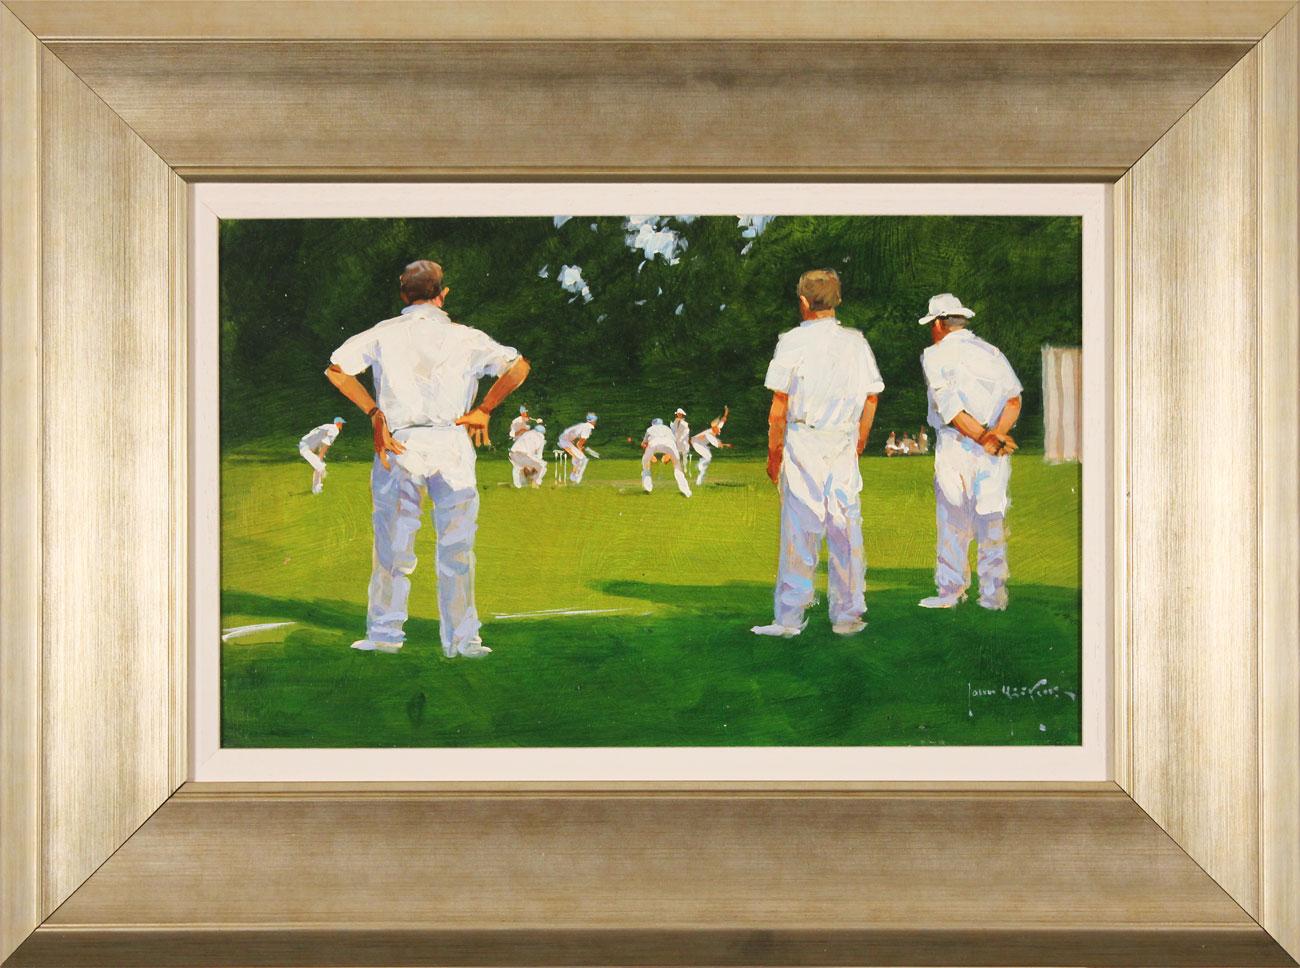 John Haskins, Original oil painting on panel, Last Man In, click to enlarge